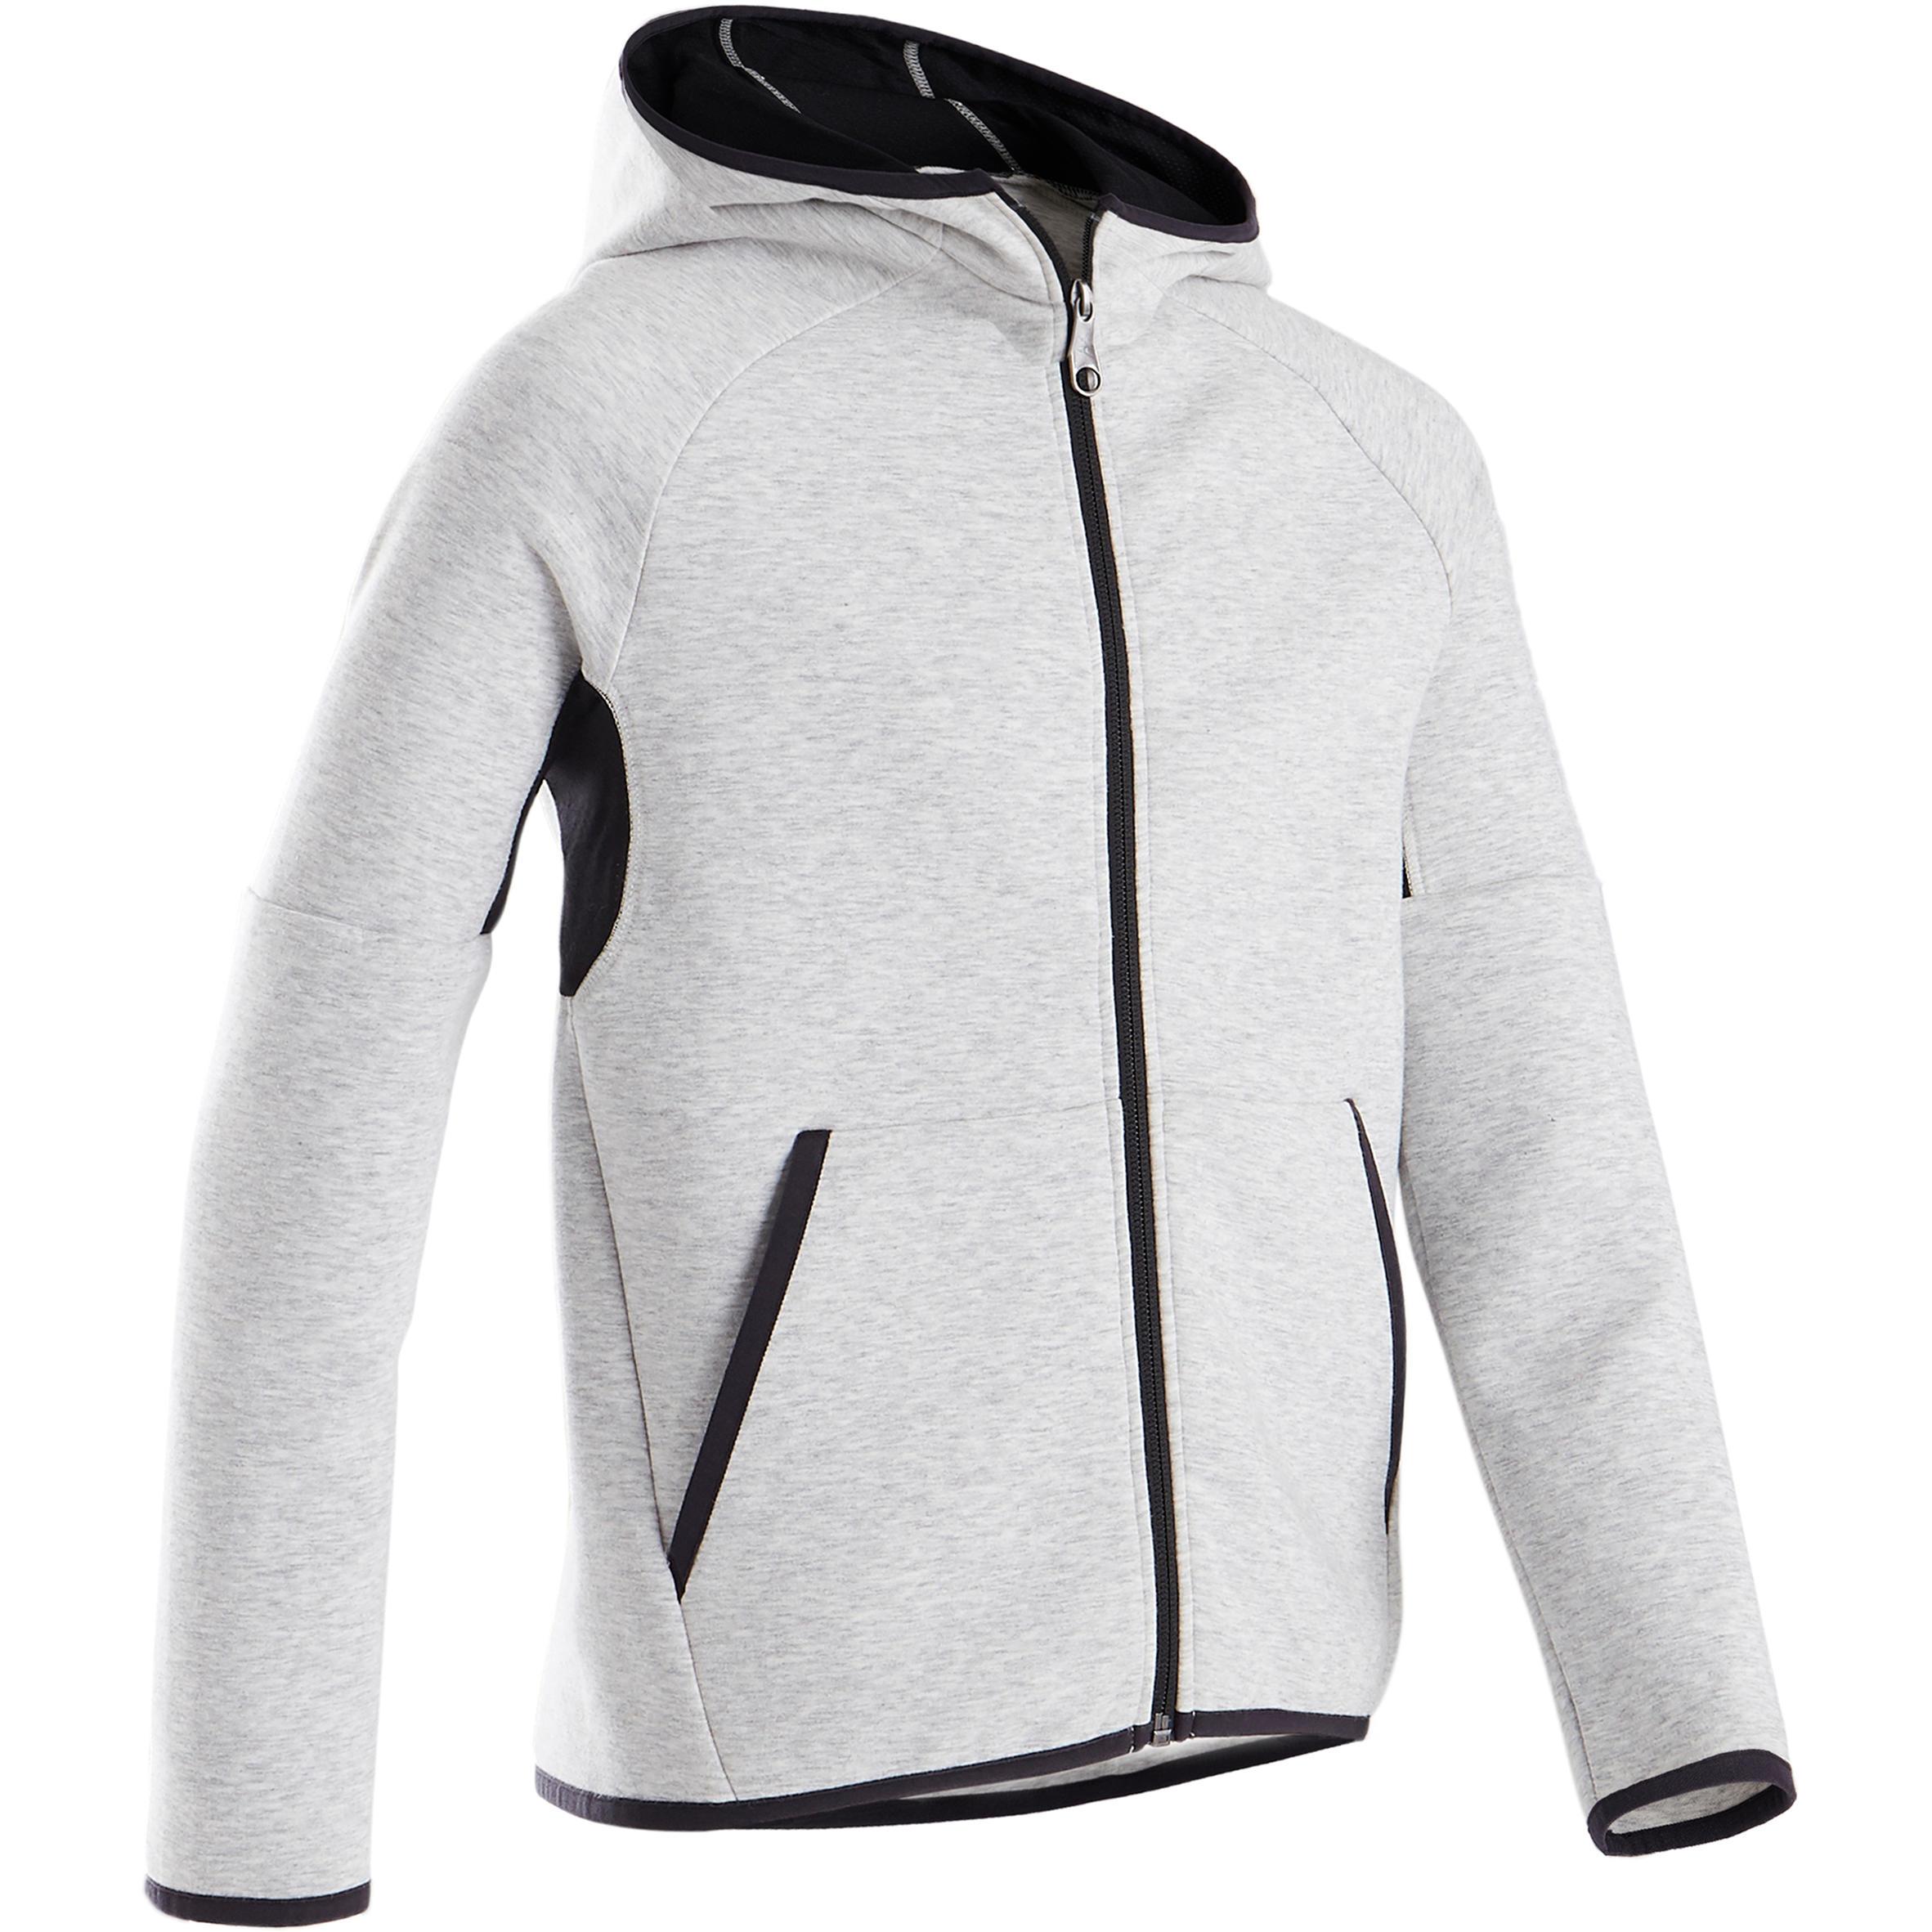 Jachetă bumbac 500B gri băieți